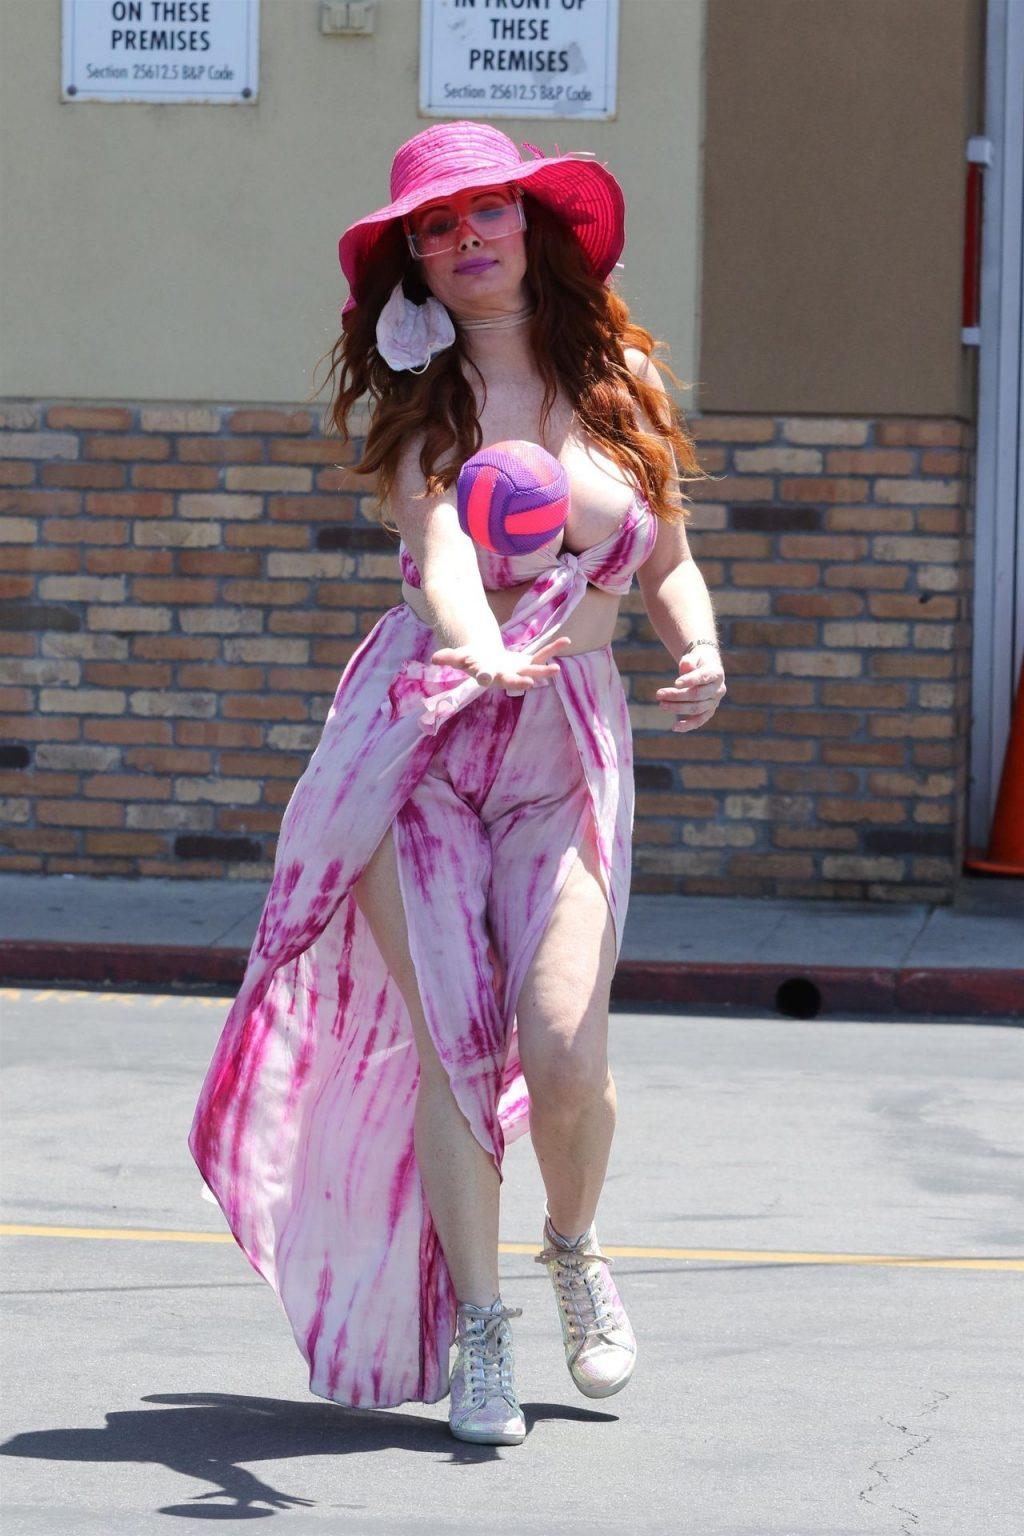 Phoebe Price Suffers a Nip Slip While Playing Ball (11 Photos)